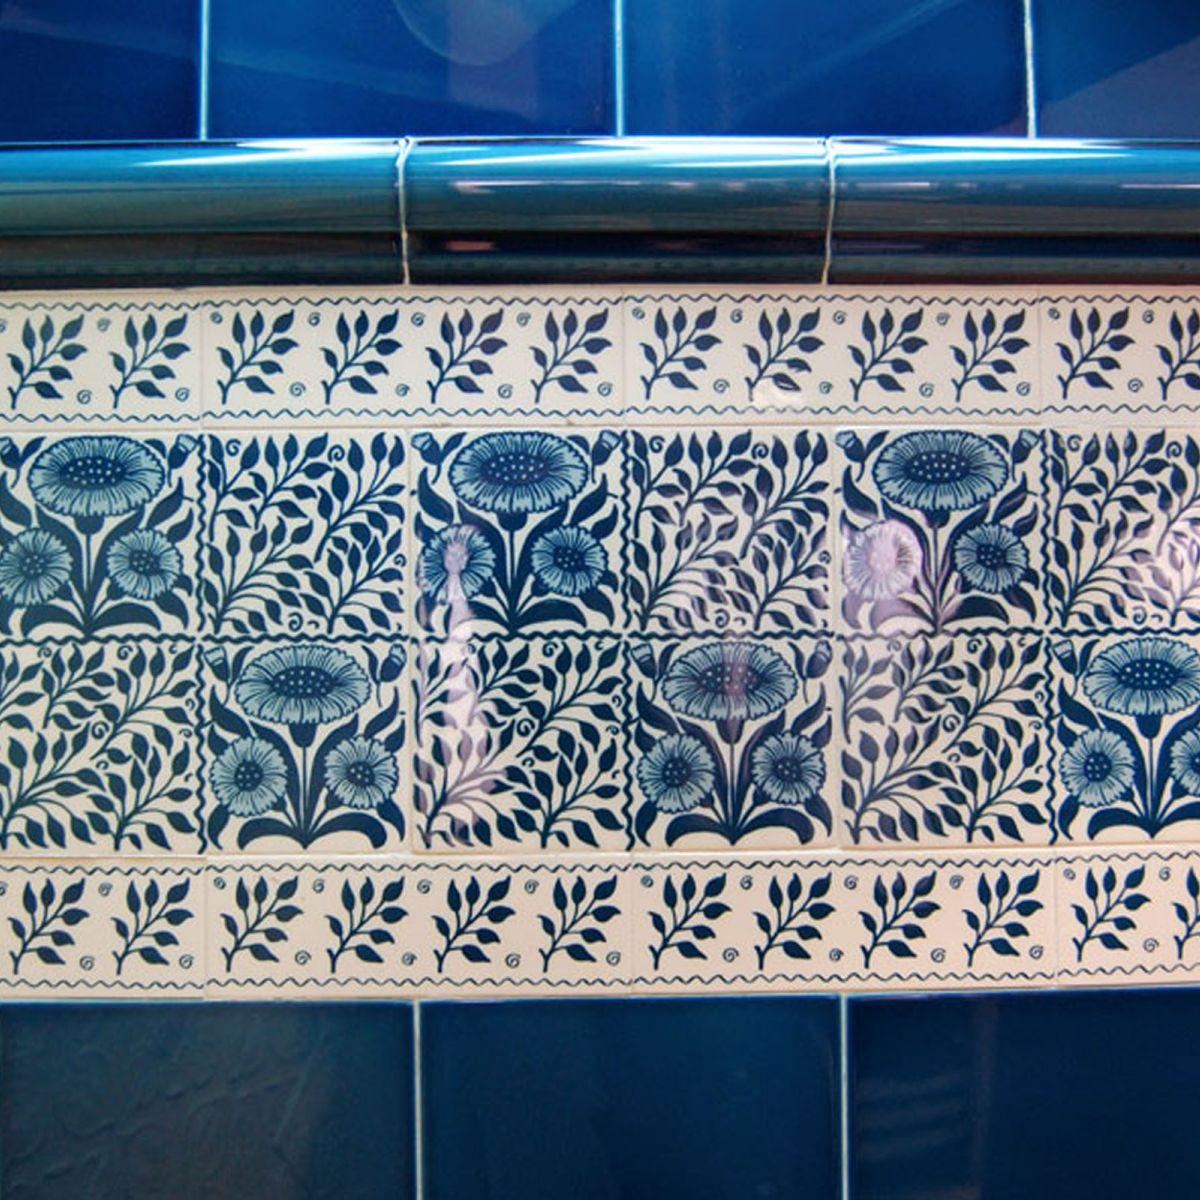 Demo Victorian Oreton blue Classic Printed decorative tiles 152x152mm - exterior use